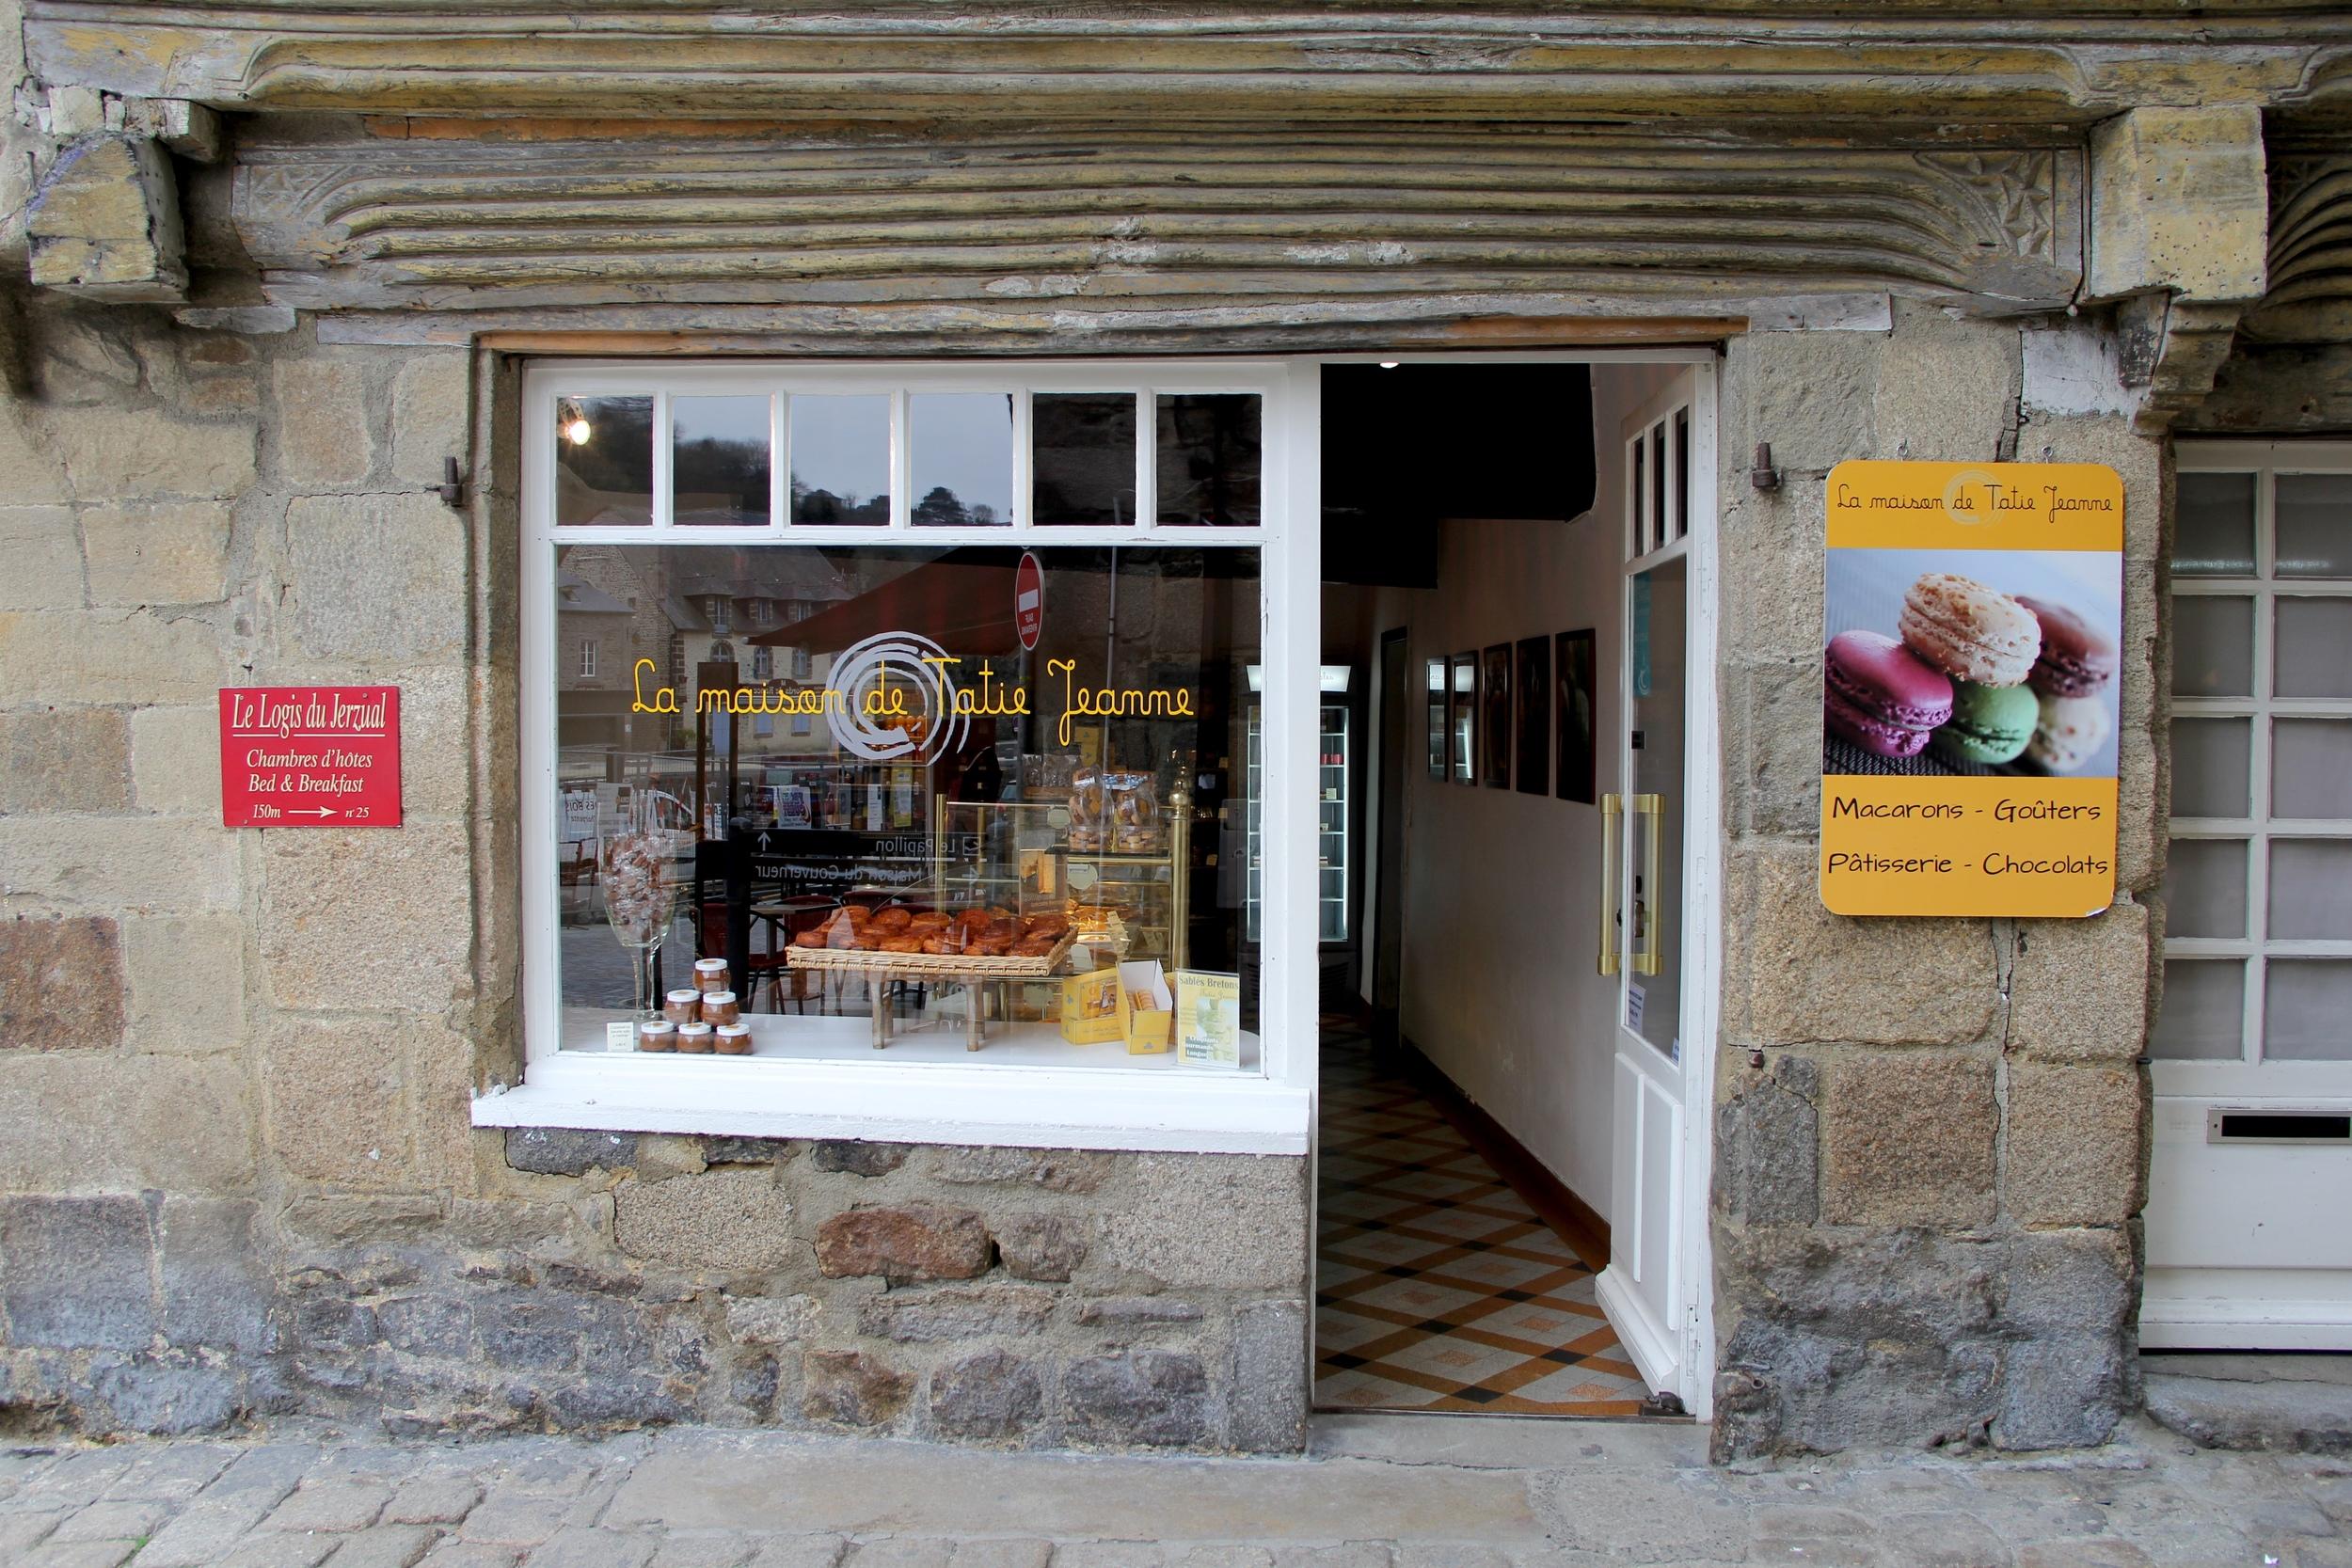 Bakery along Rue du Petit-Fort in Dinan, France